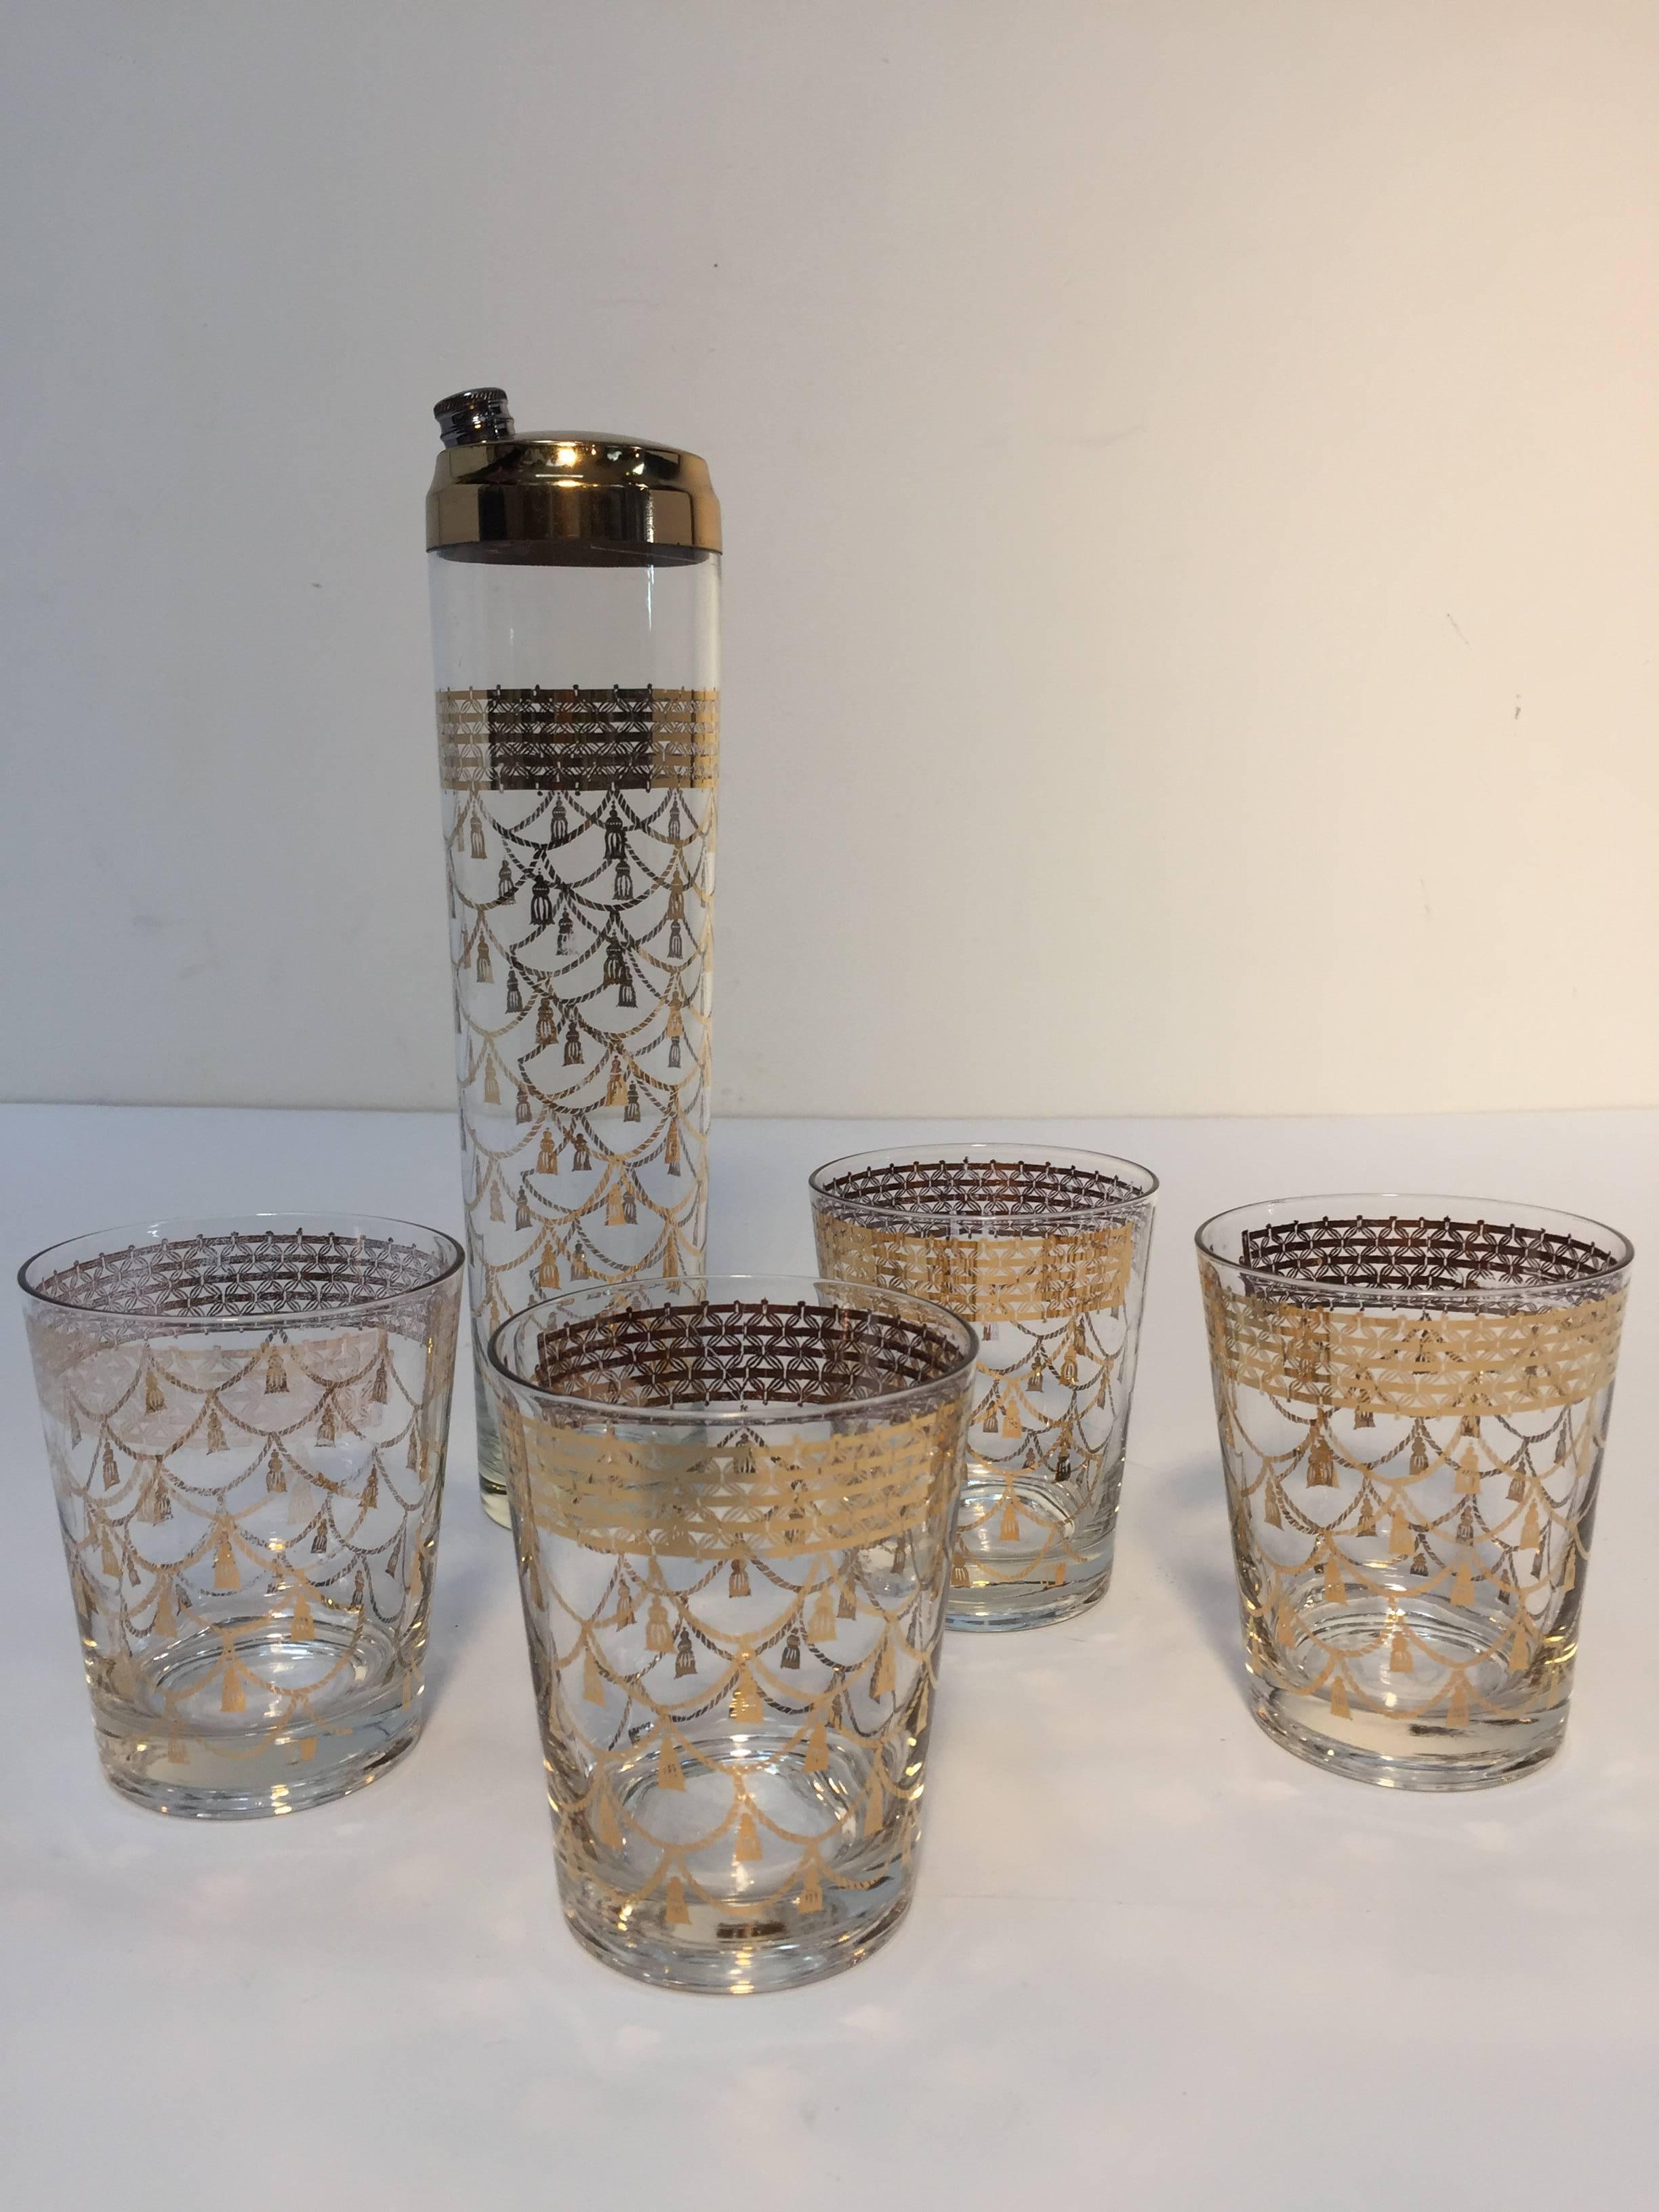 Vintage Cocktail Set Of Midcentury Barware Glasses With